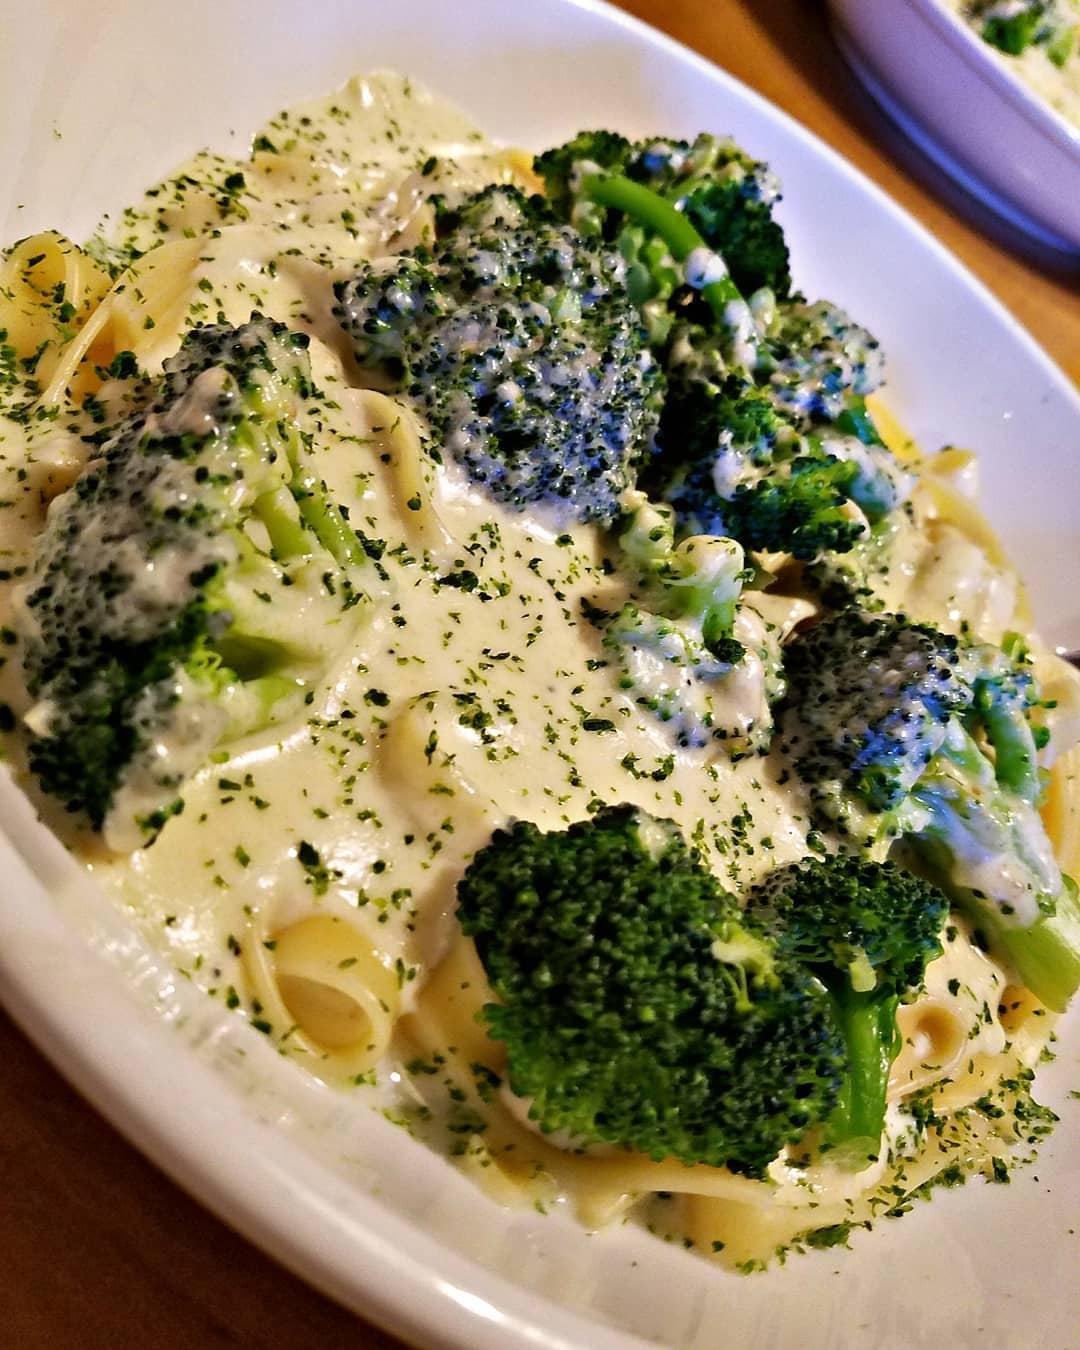 vegetarian vegan options olive garden italian restaurants - Vegan Options At Olive Garden